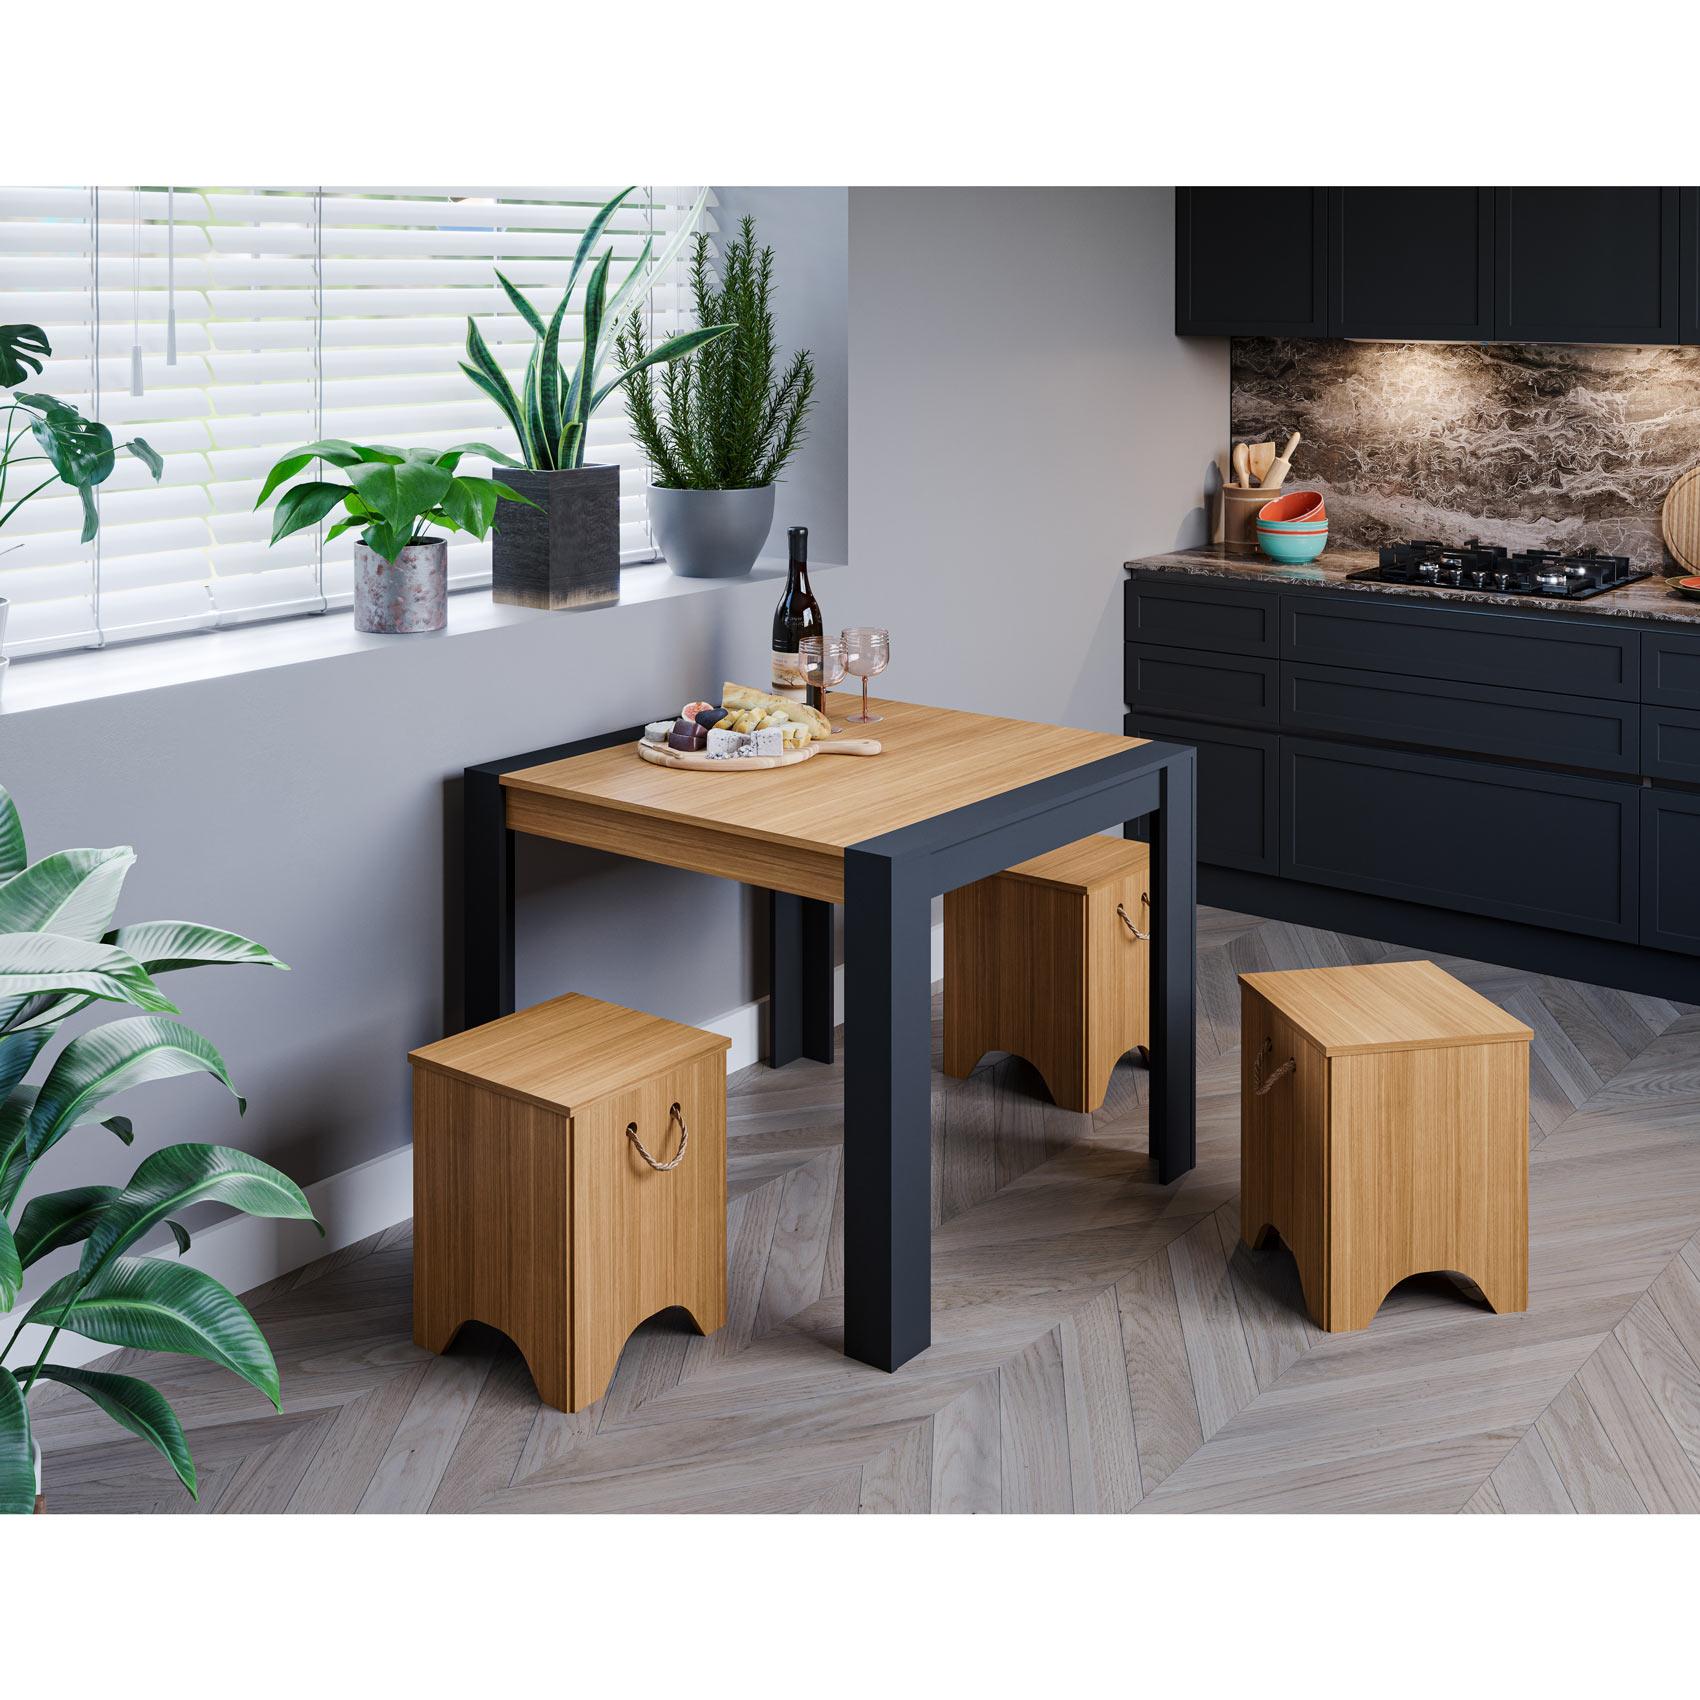 Mesa para Sala de Jantar Grace 90 x 90 cm 100% MDF e 4 Bancos Kim Cimol Chumbo/Nature